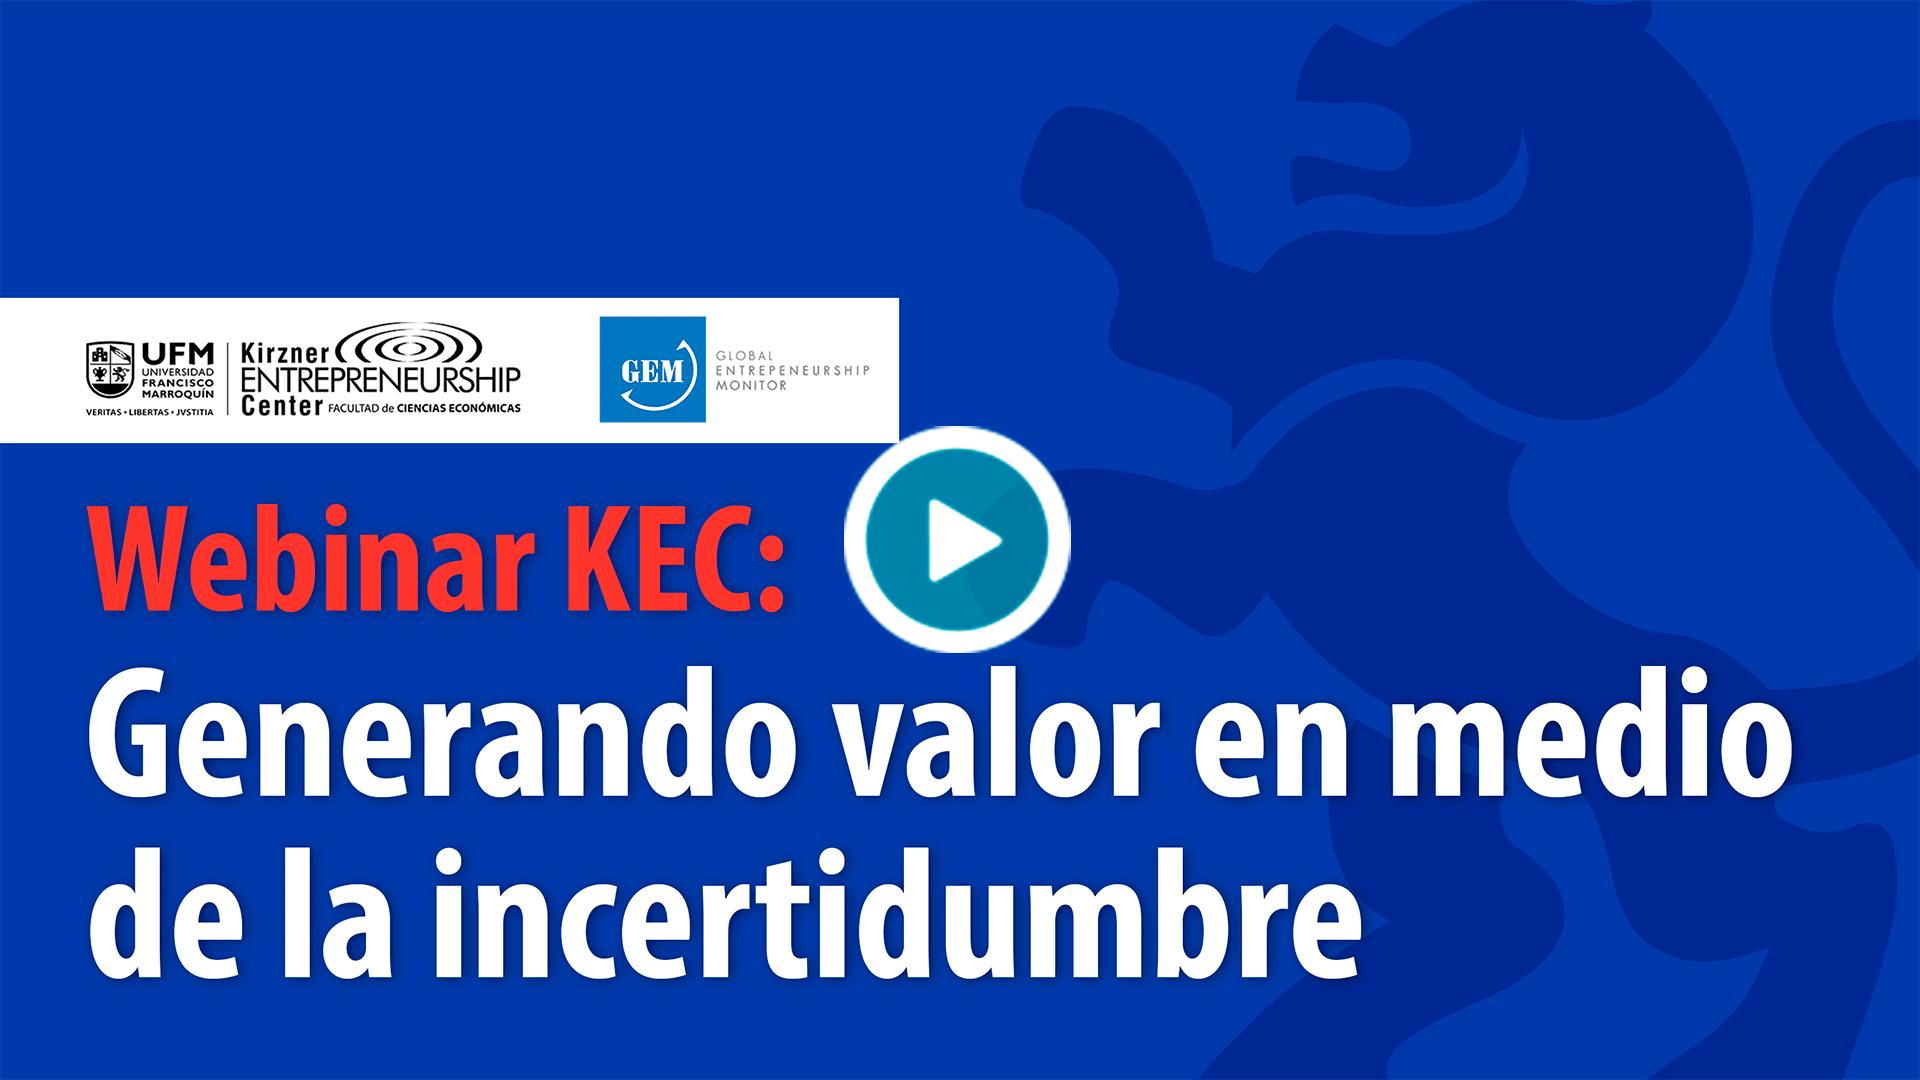 20200623_kecgem1_Generando_Valor_Web_KEC